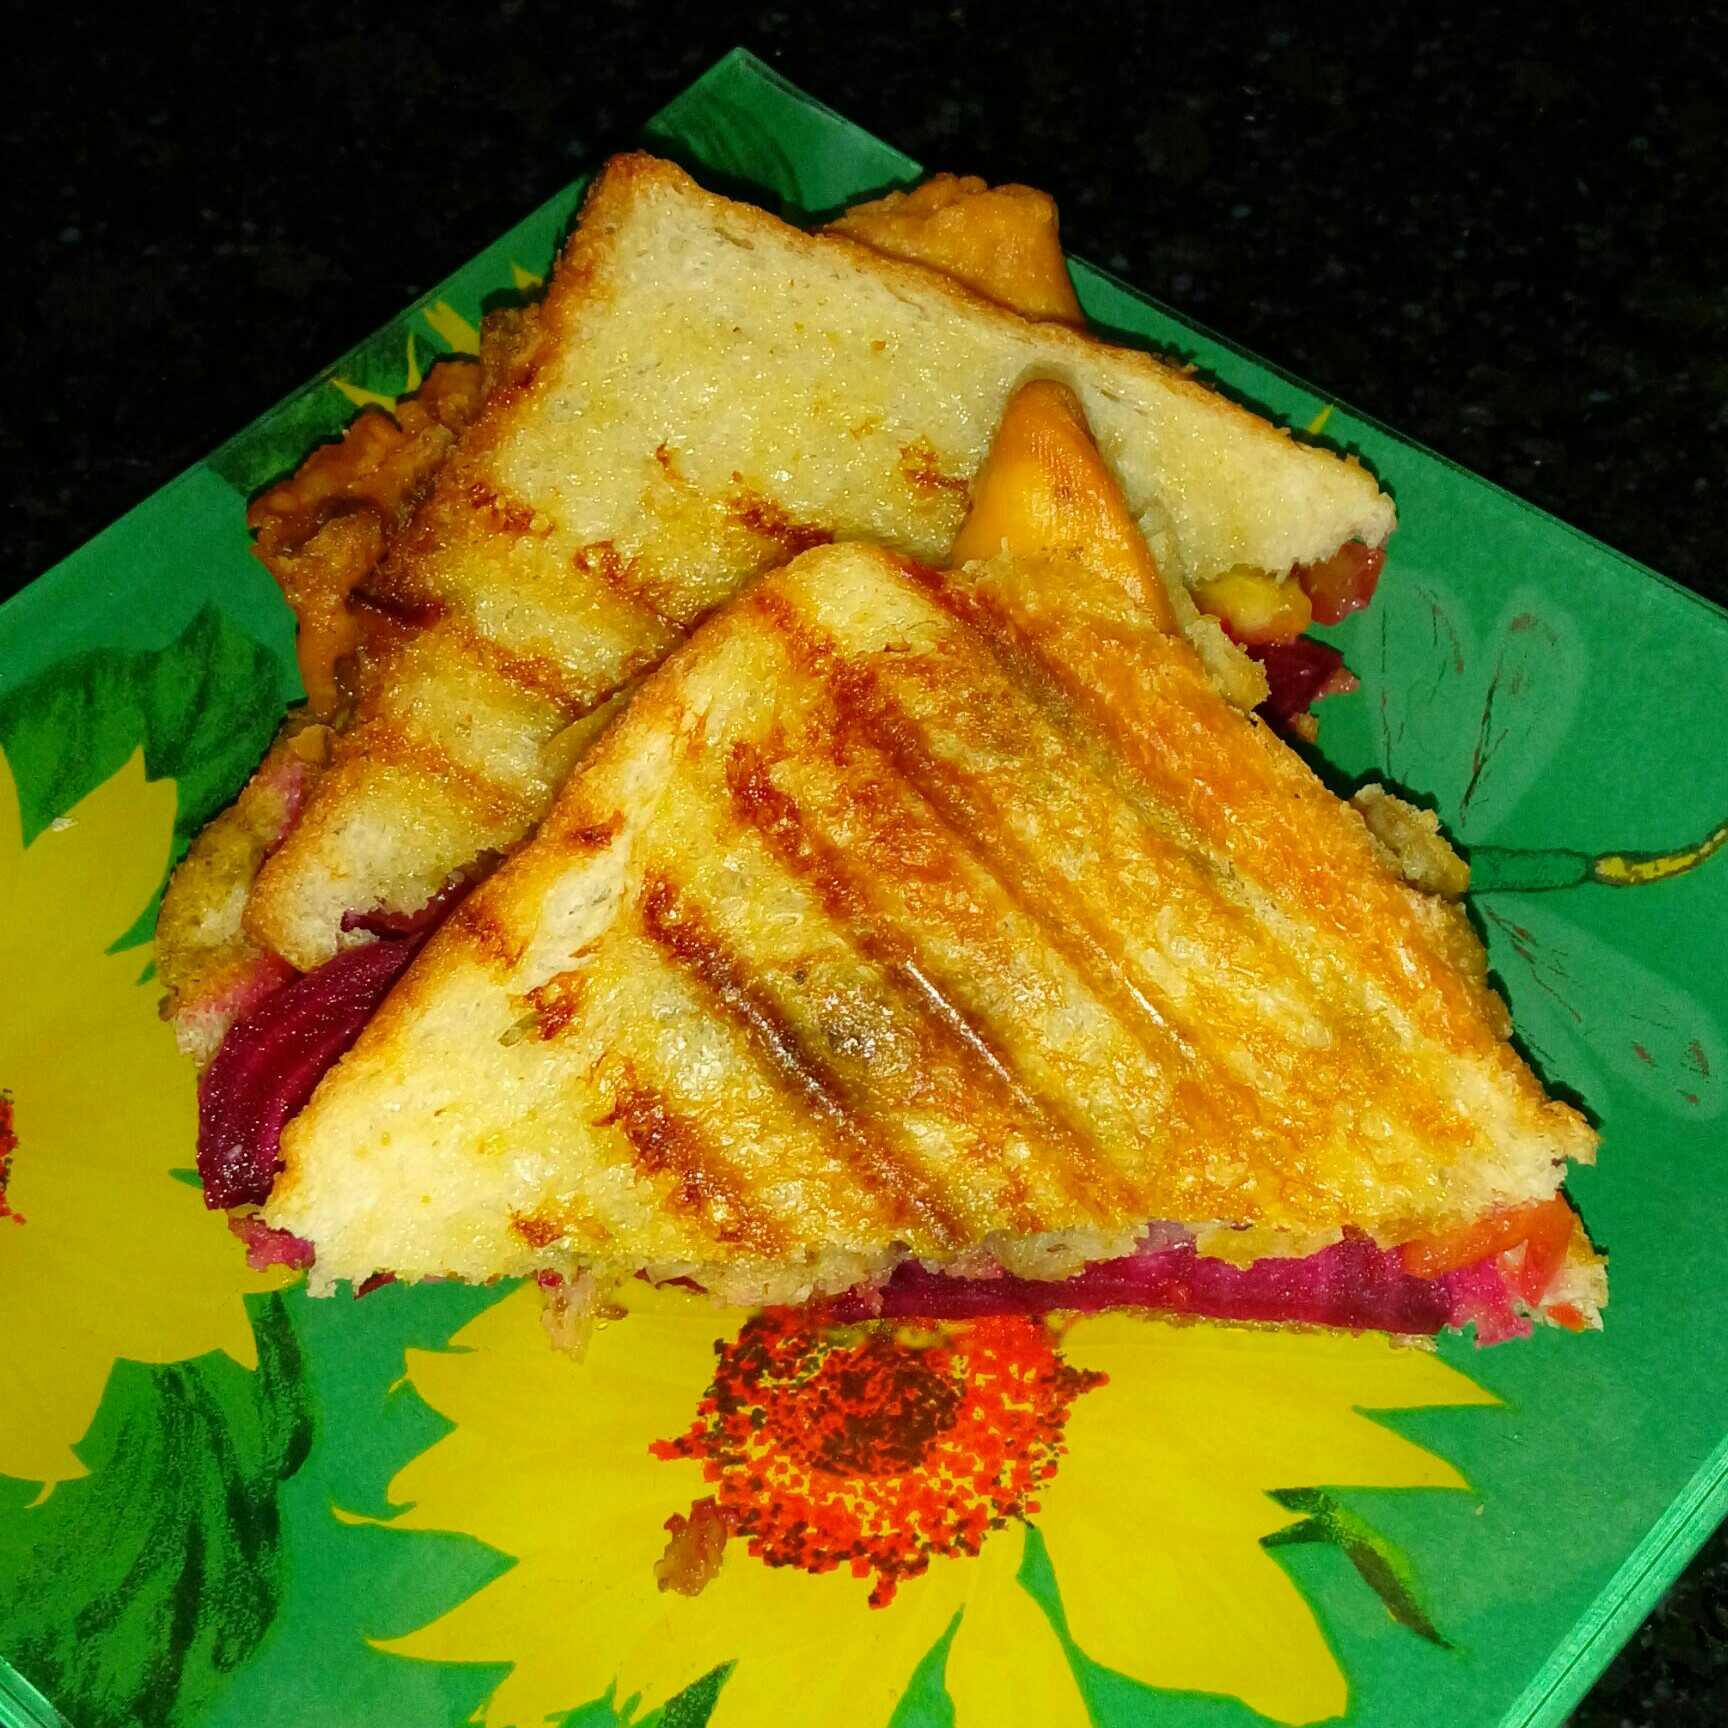 Grilled samosa sandwich